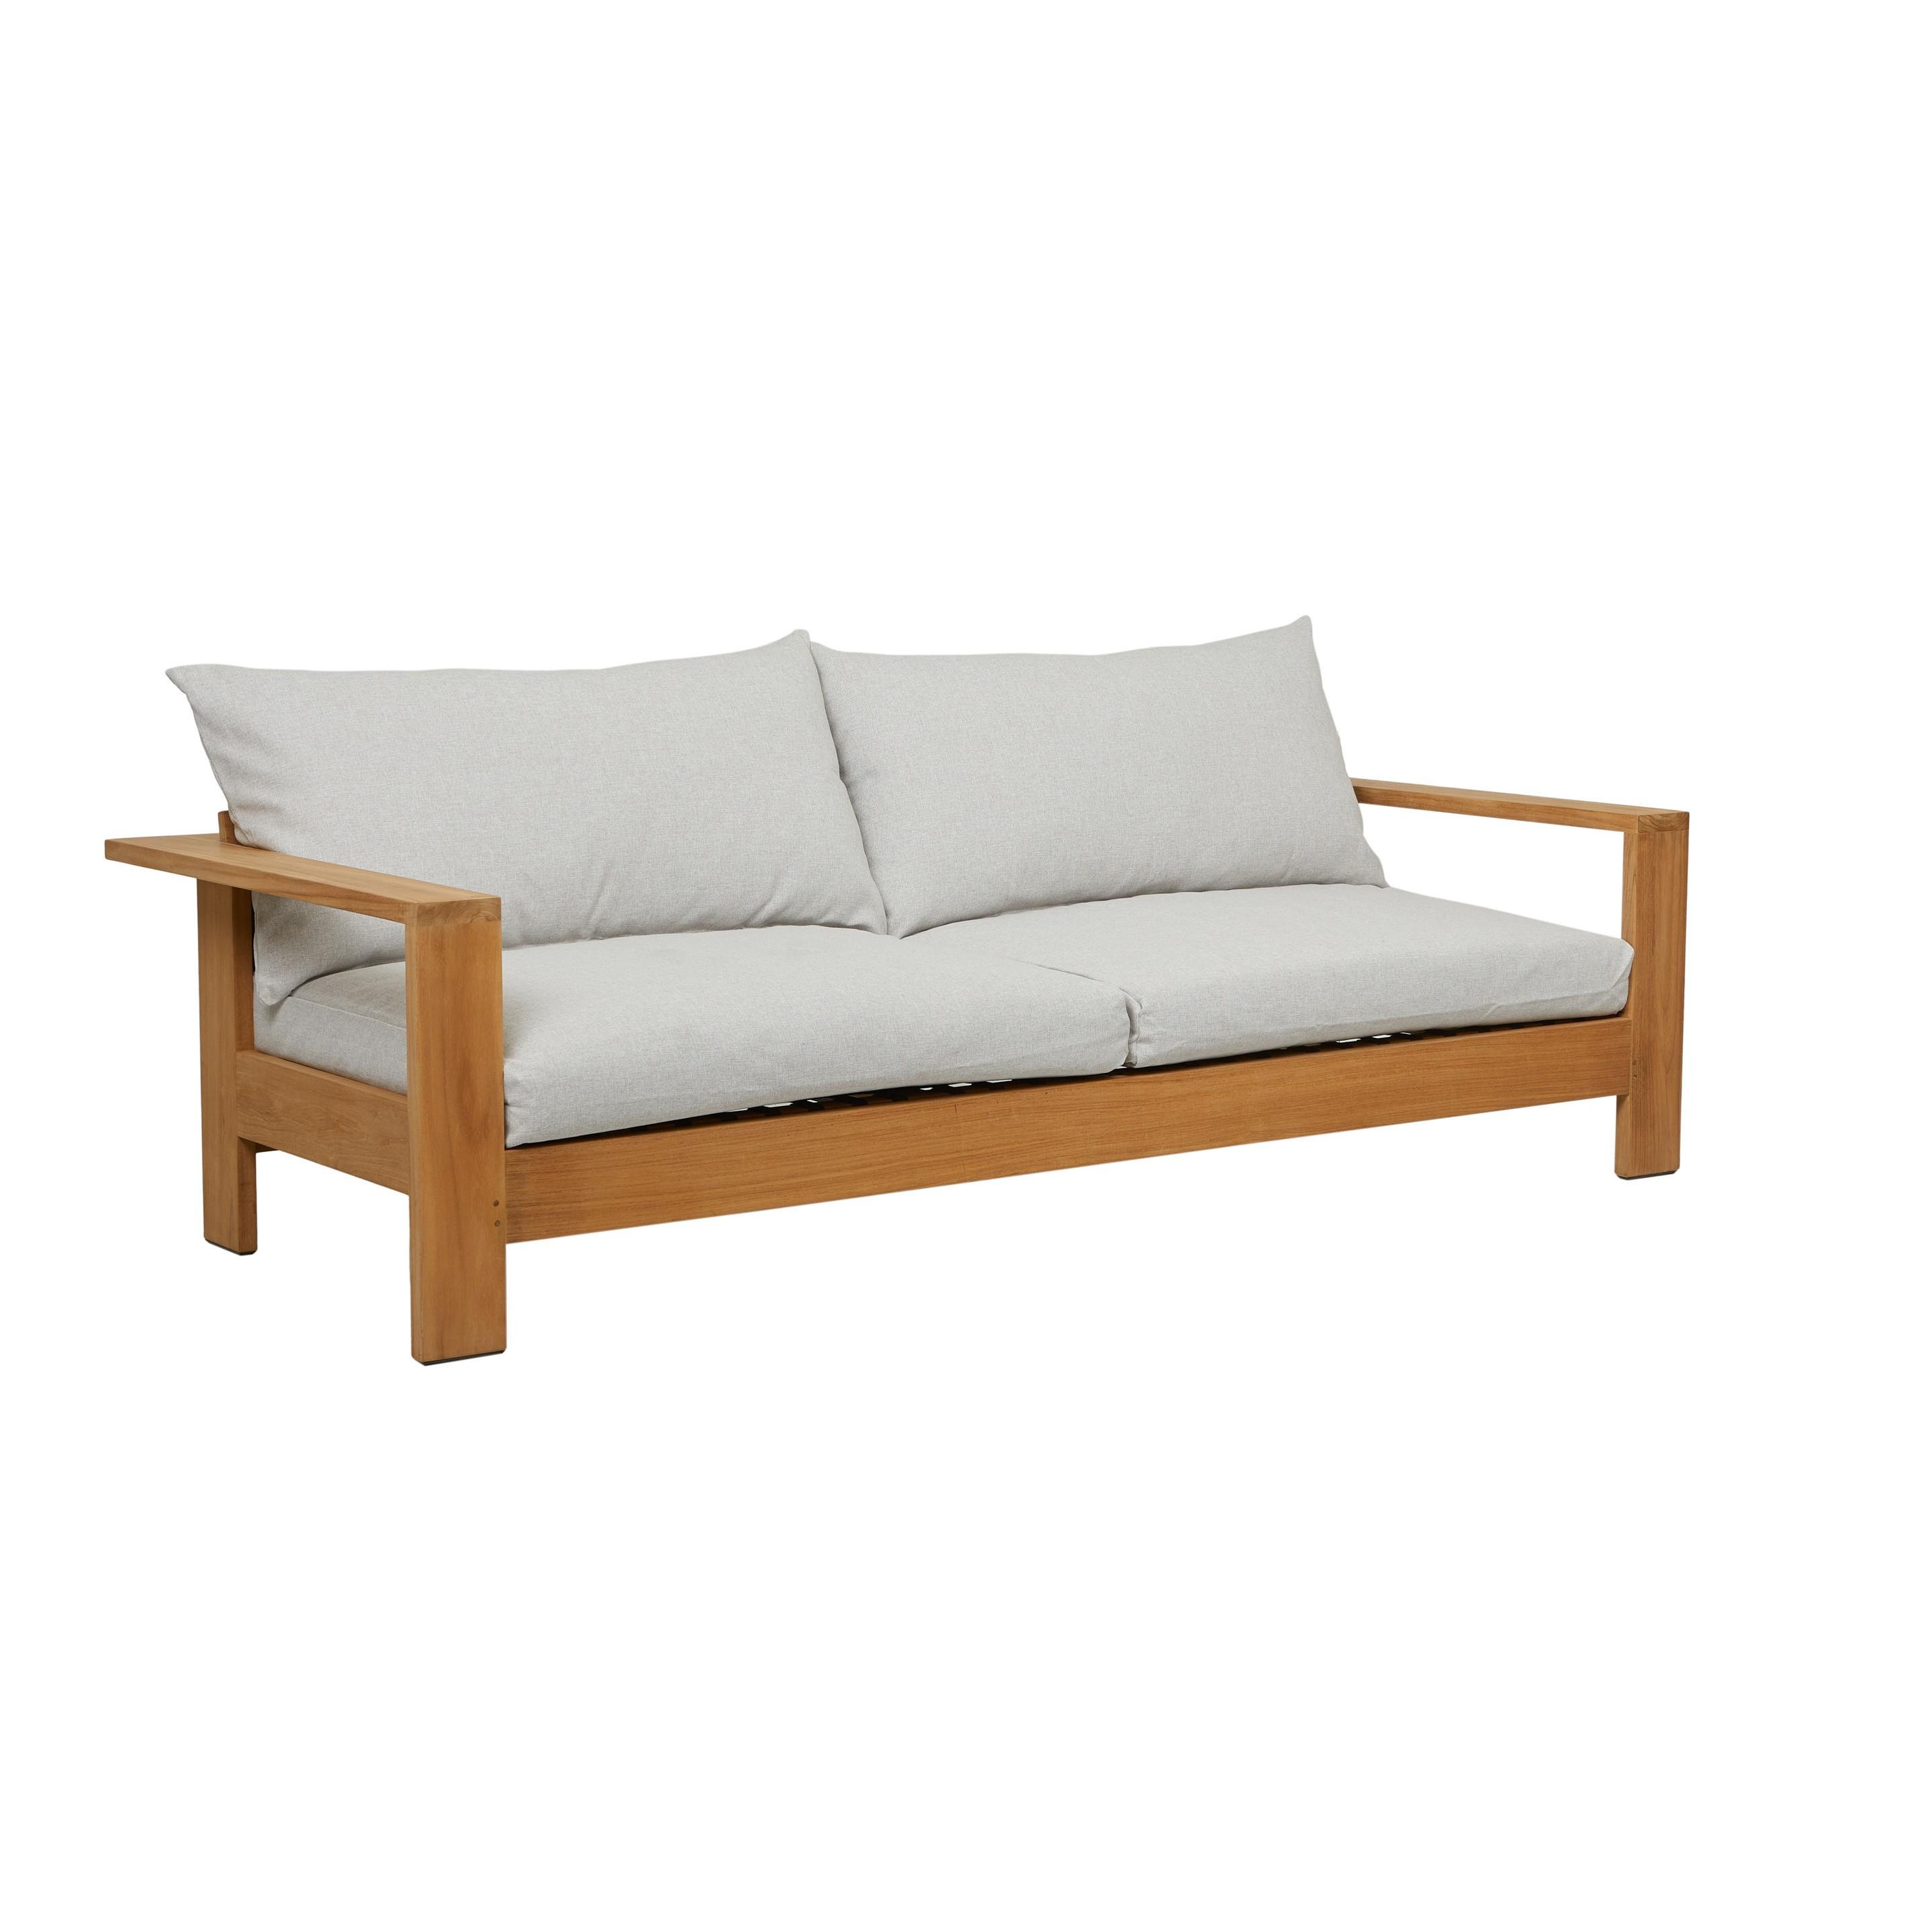 Furniture Hero-Images Sofas hamptons-three-seater-03